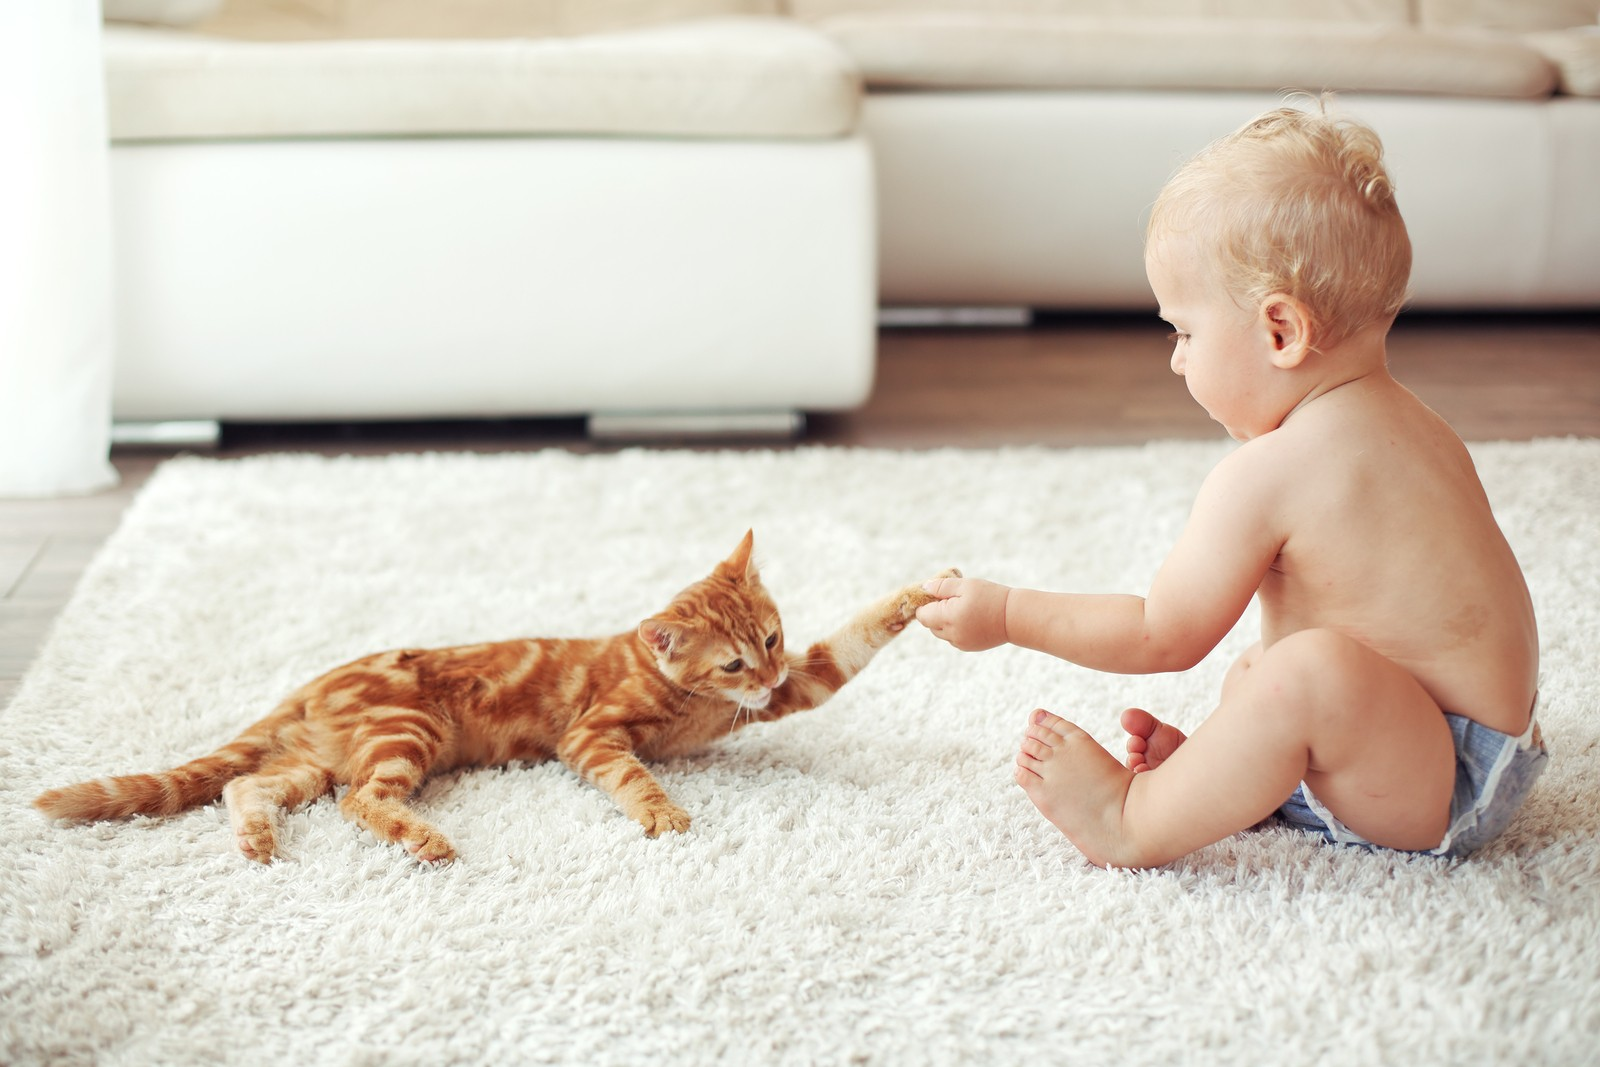 Не опасна ли дружба кошки с младенцем